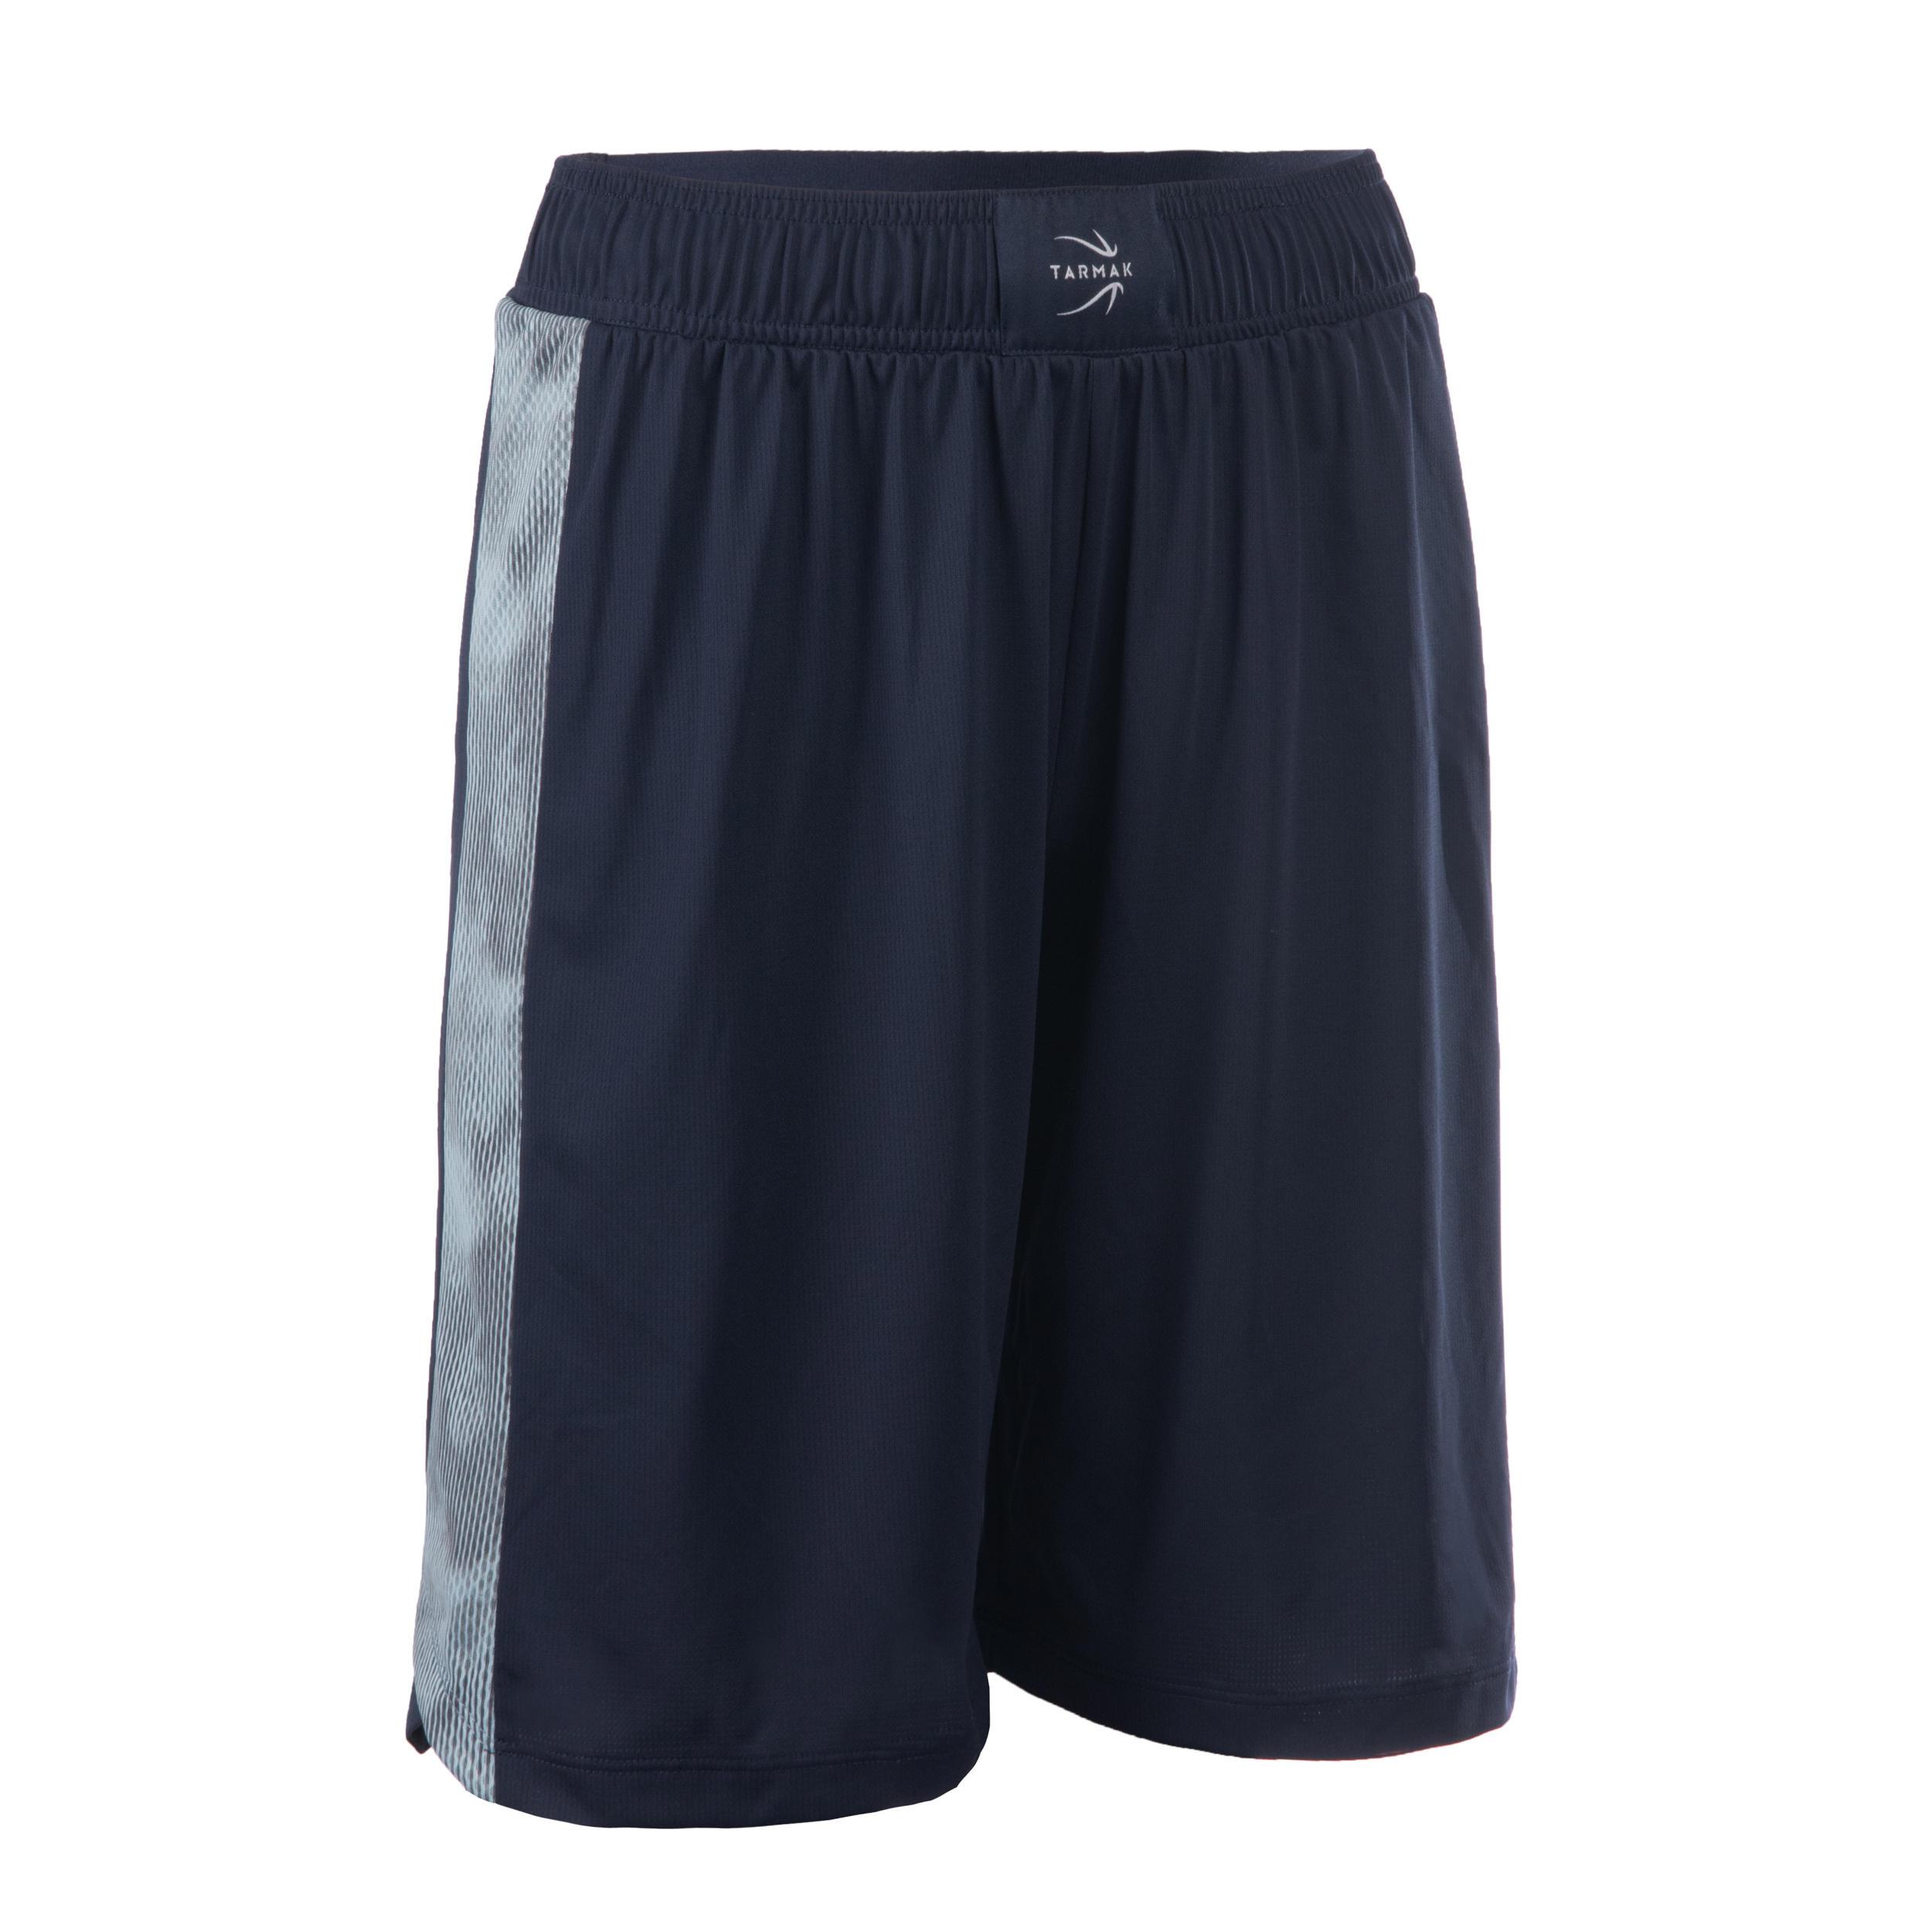 Basketballshorts SH500 Damen | Sportbekleidung > Sporthosen > Basketballshorts | Tarmak